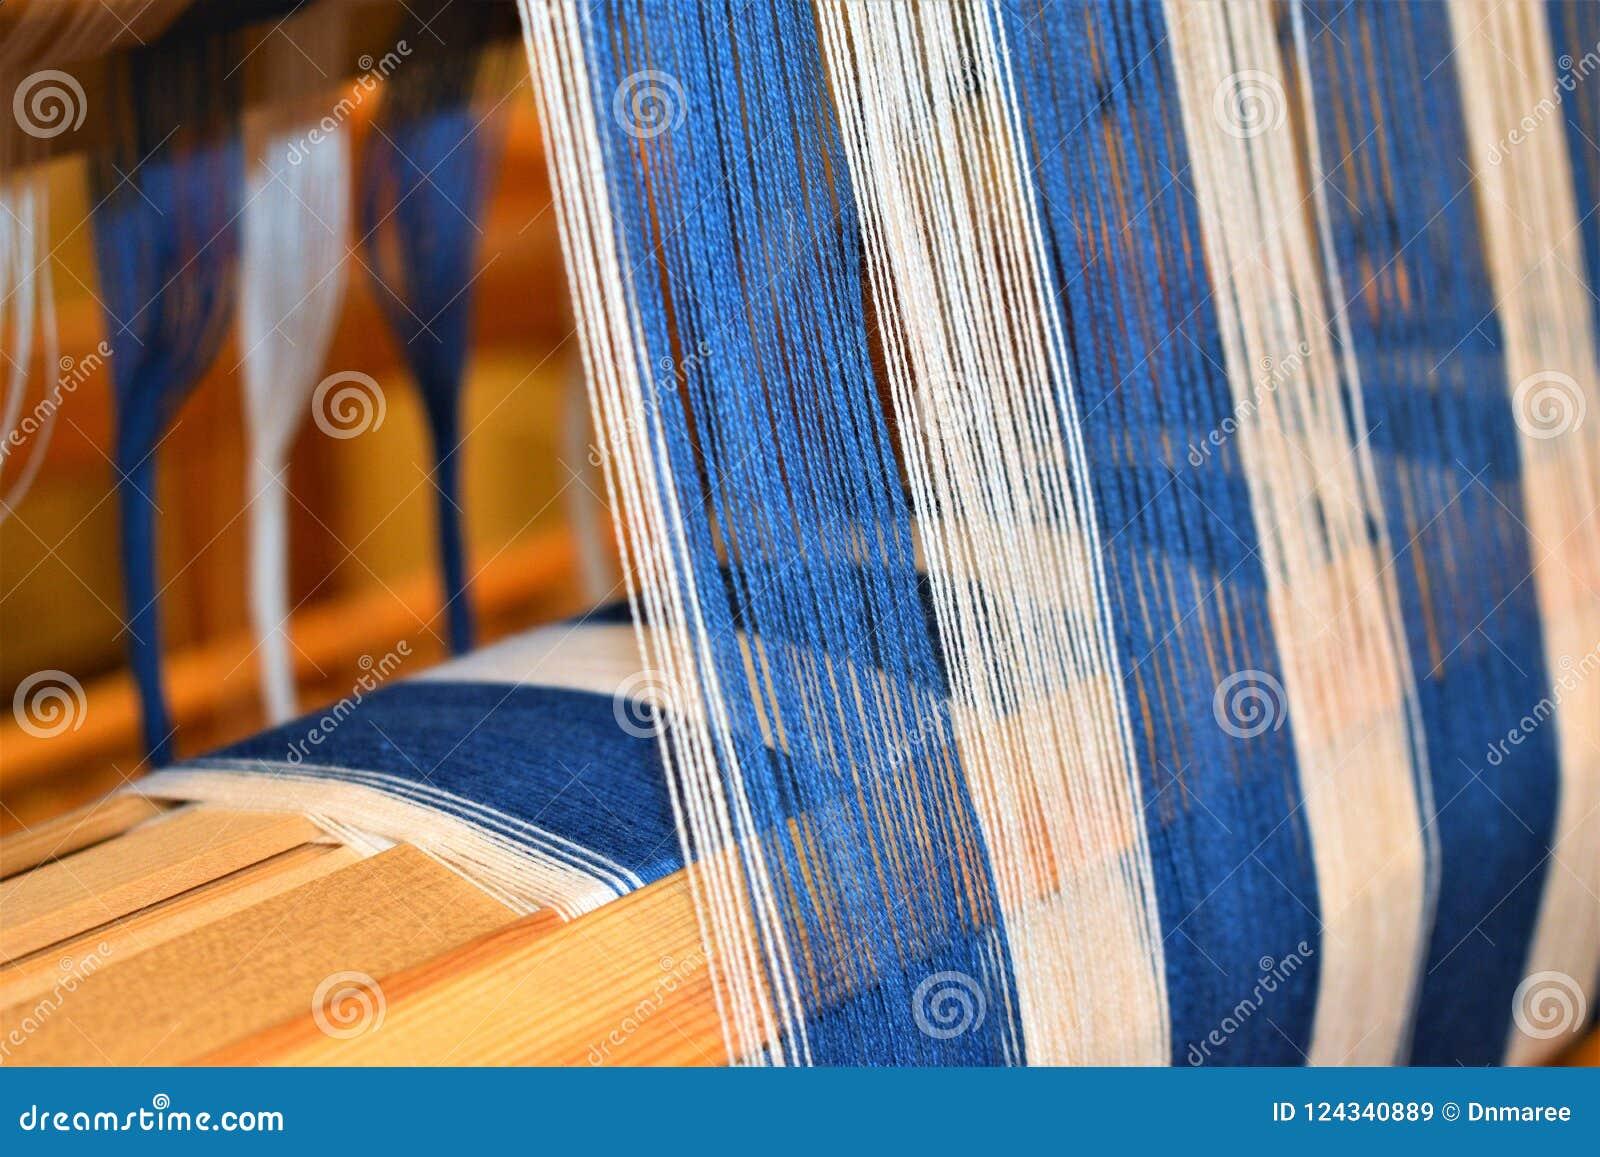 Closeup of Blue and white striped warp. Weaving. Handweaving. Textiles. Fiber.